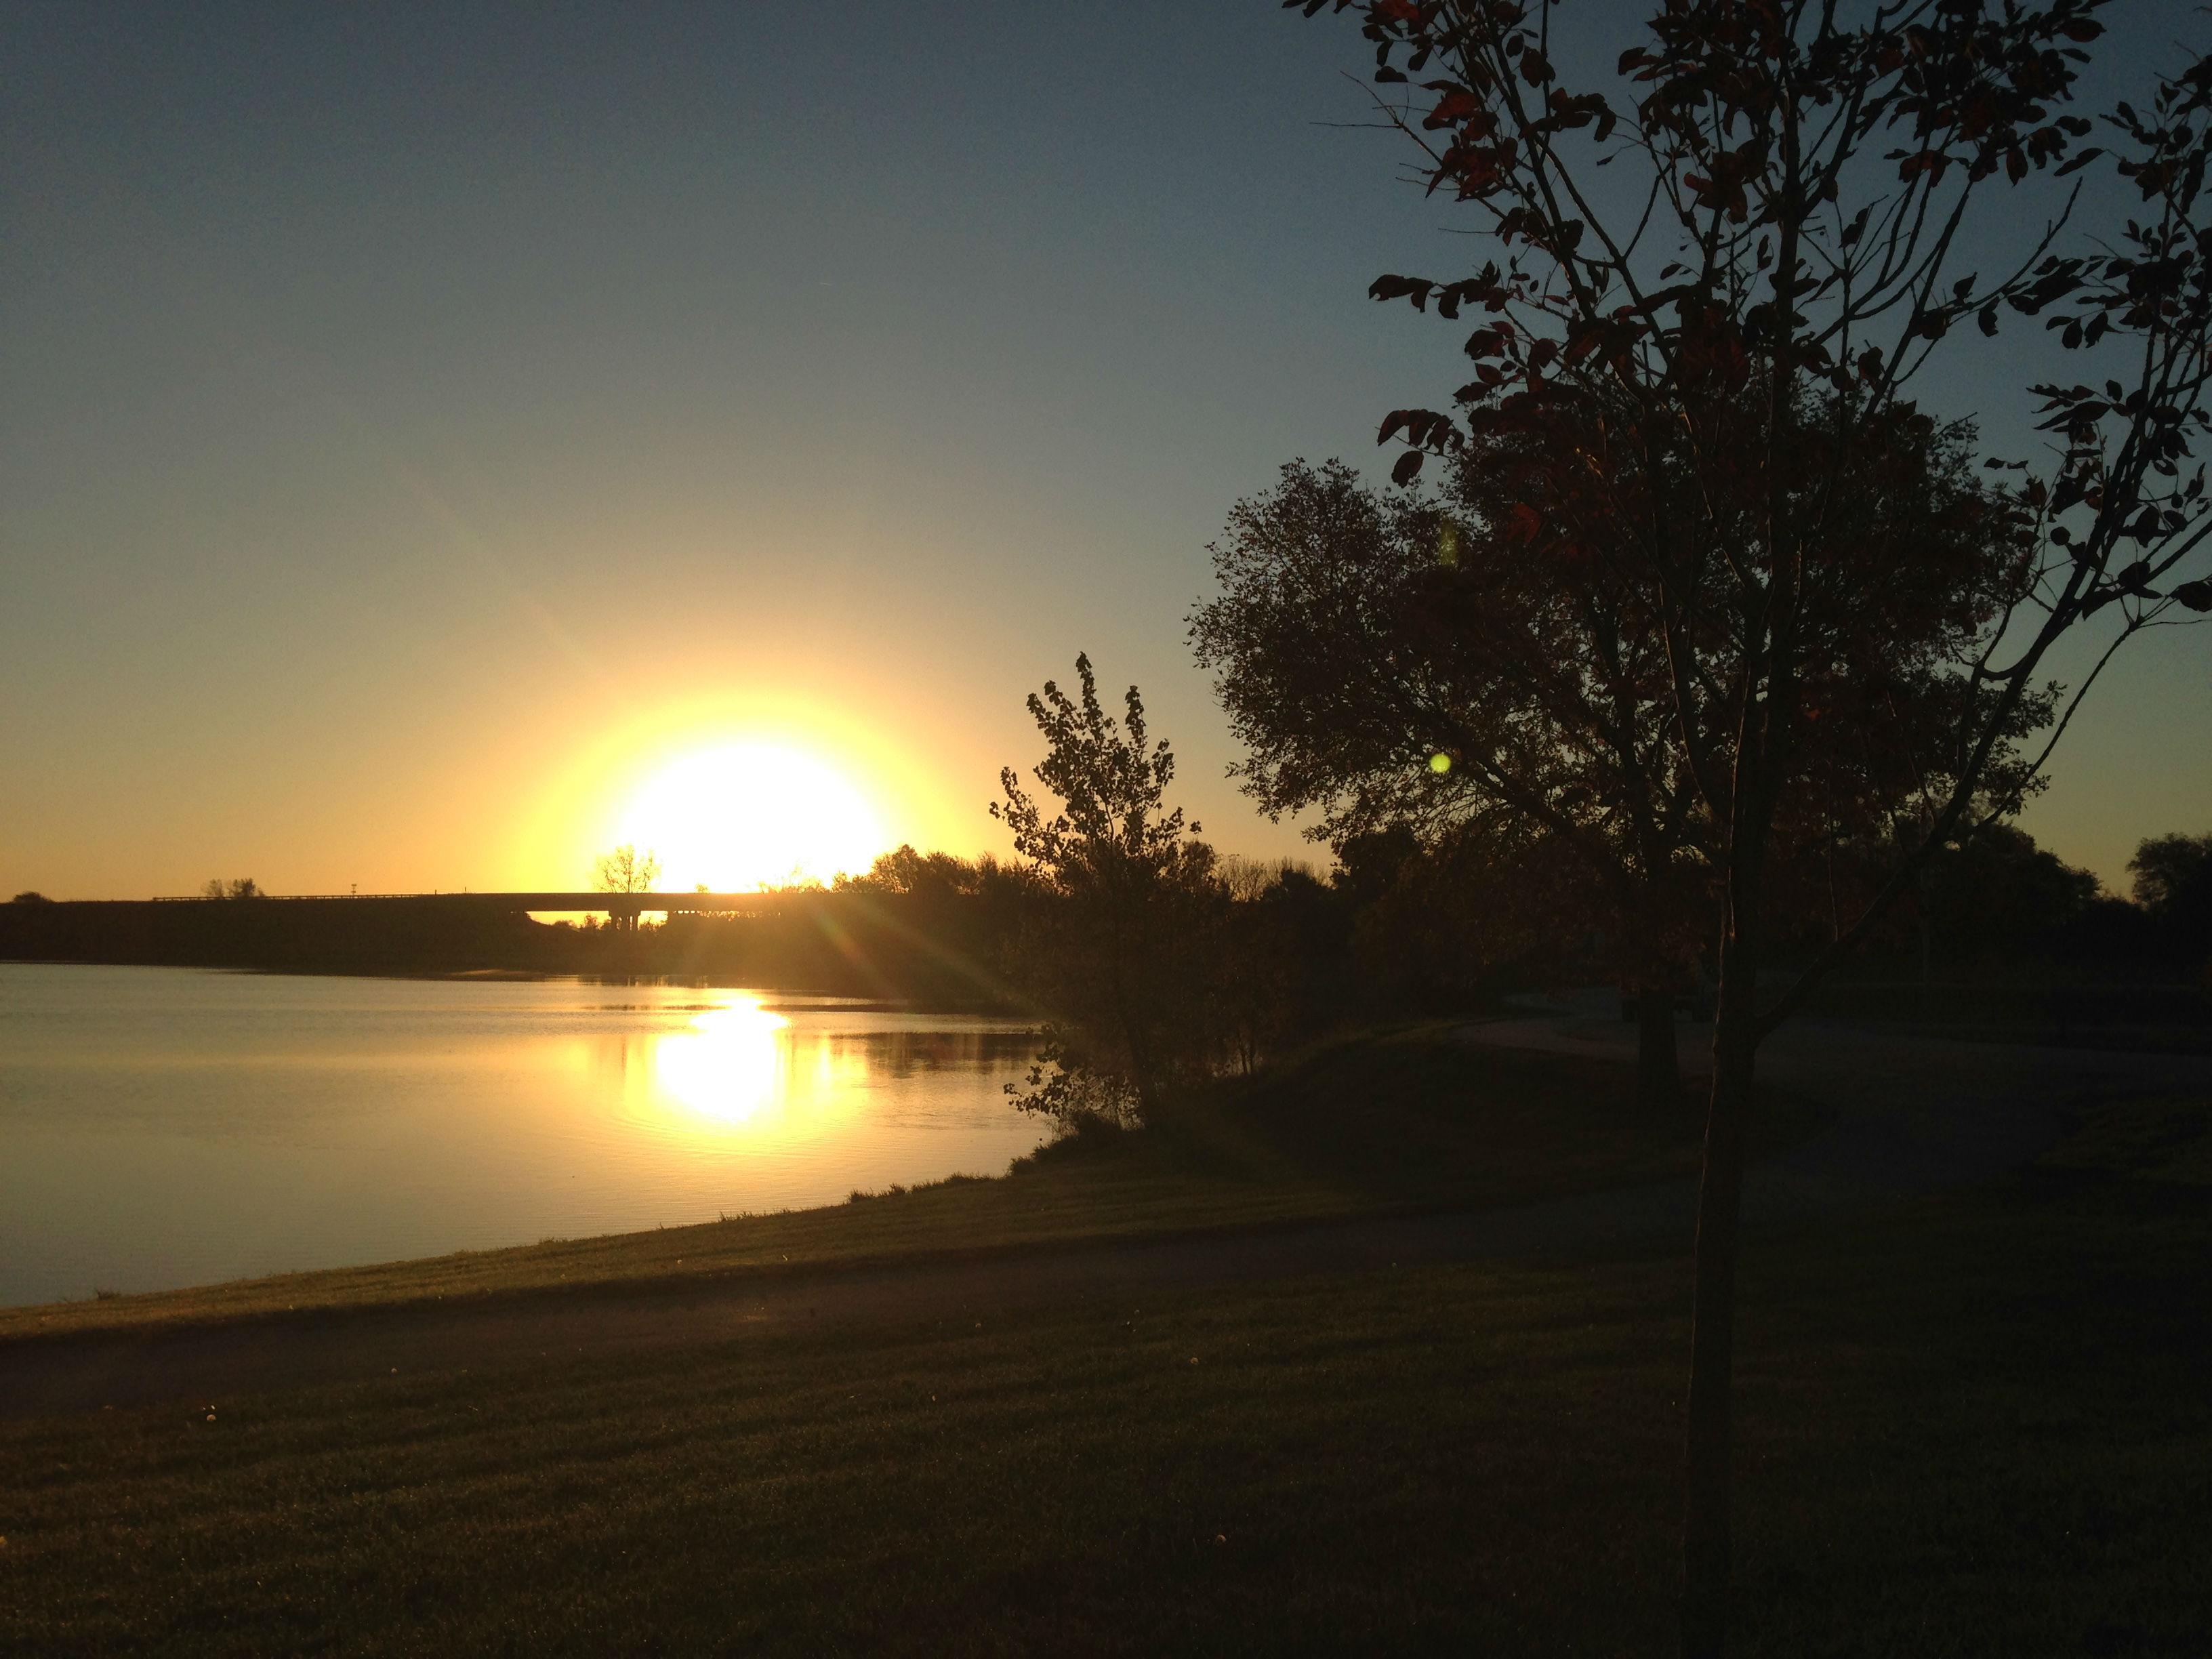 Sunrise Lake Bondurant Iowa 2016